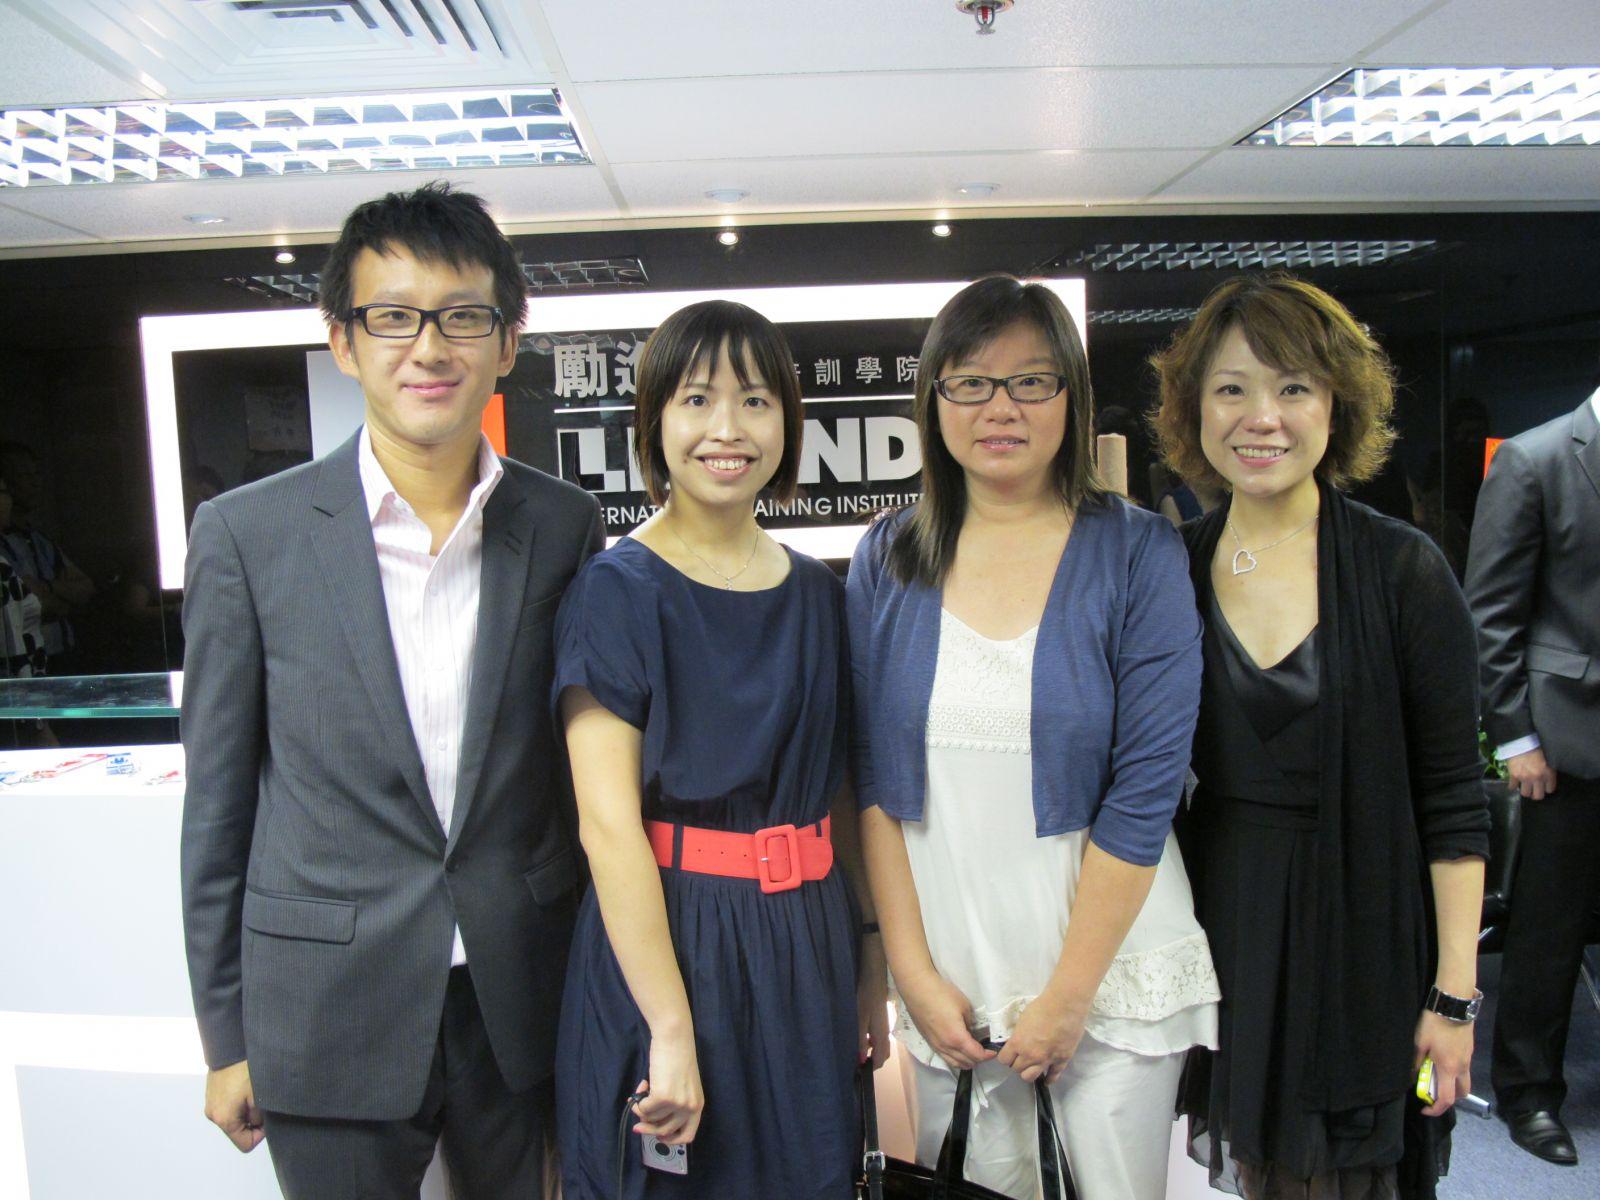 Betty (左二) 和 Miranda (右二) 為澳專教育集團之升學輔導團隊中成員,本學院與其集團為友好合作夥伴,目的為學員升學做好準備